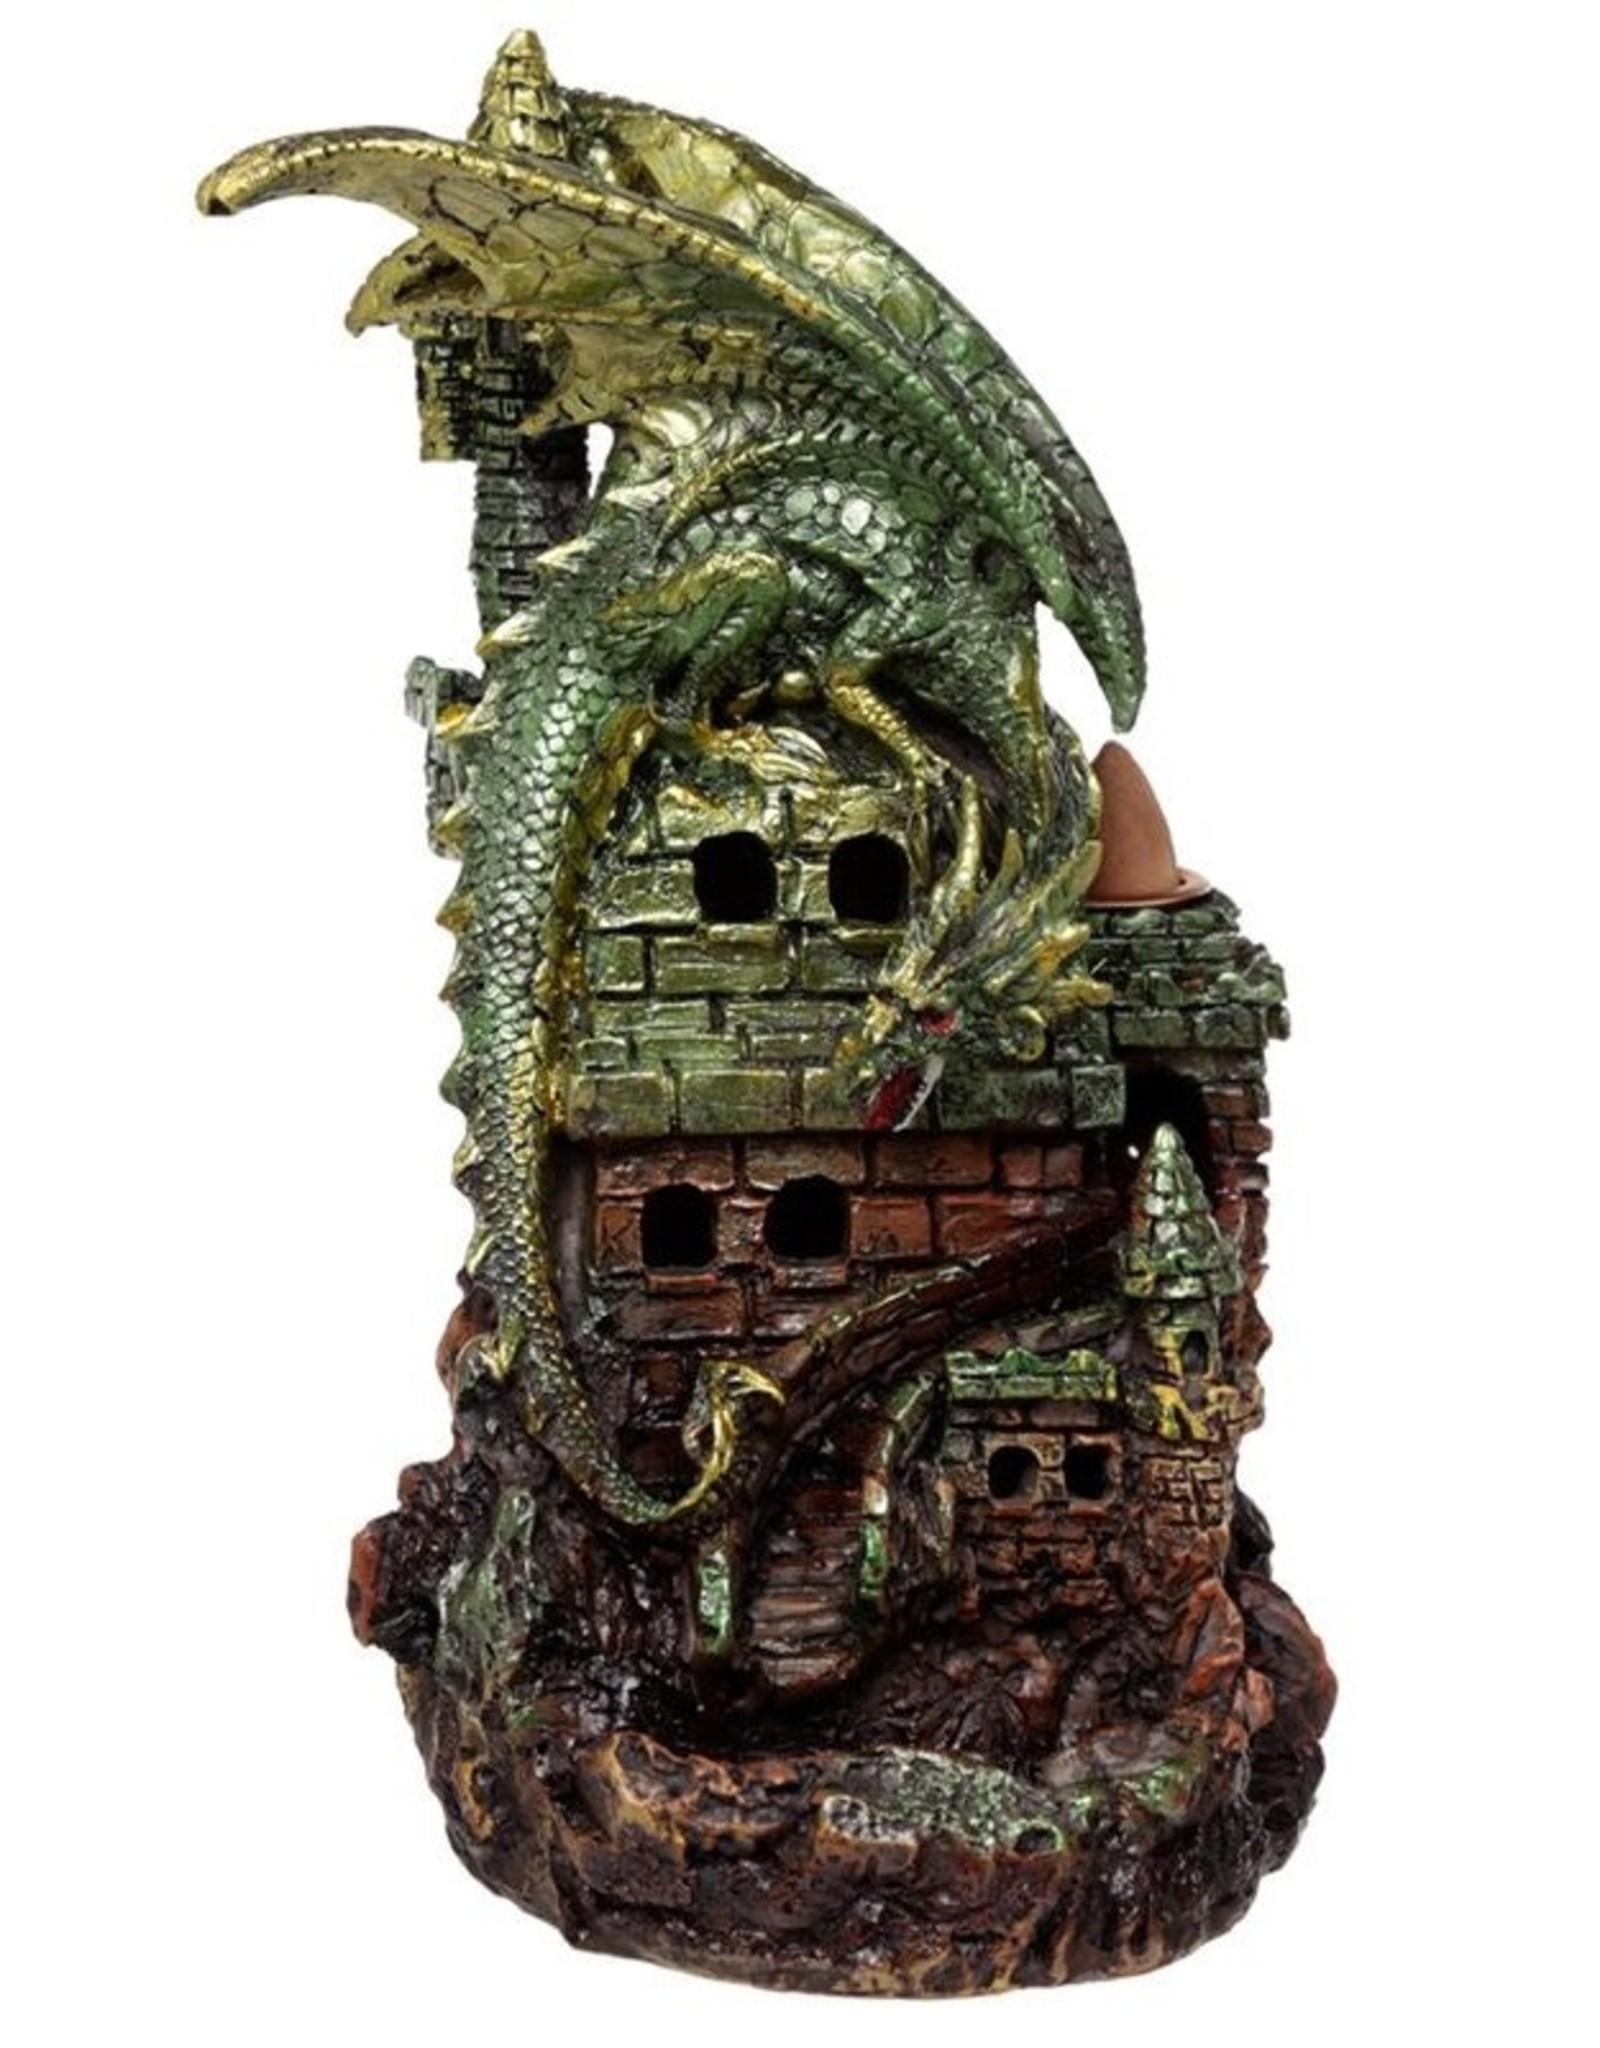 Dragon Castle Giftware Figurines Collectables - Dragon Castle LED Backflow Incense holder